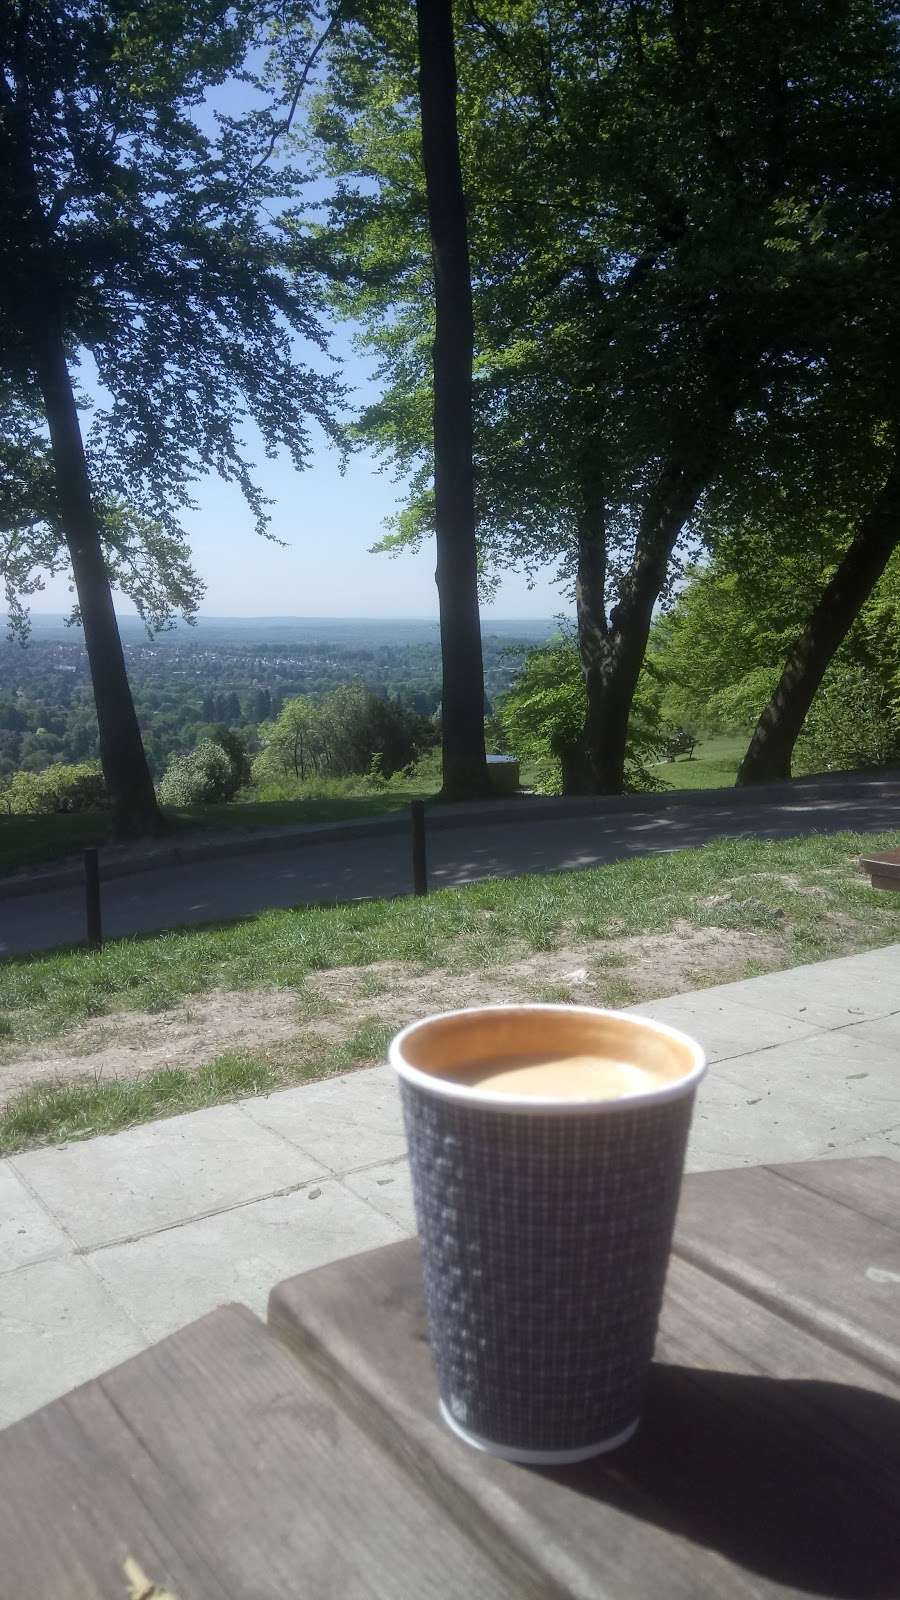 Reigate Hill Tea Room - cafe  | Photo 2 of 10 | Address: Car Park, Reigate Hill Park, Wray Ln, Reigate RH2 0HX, UK